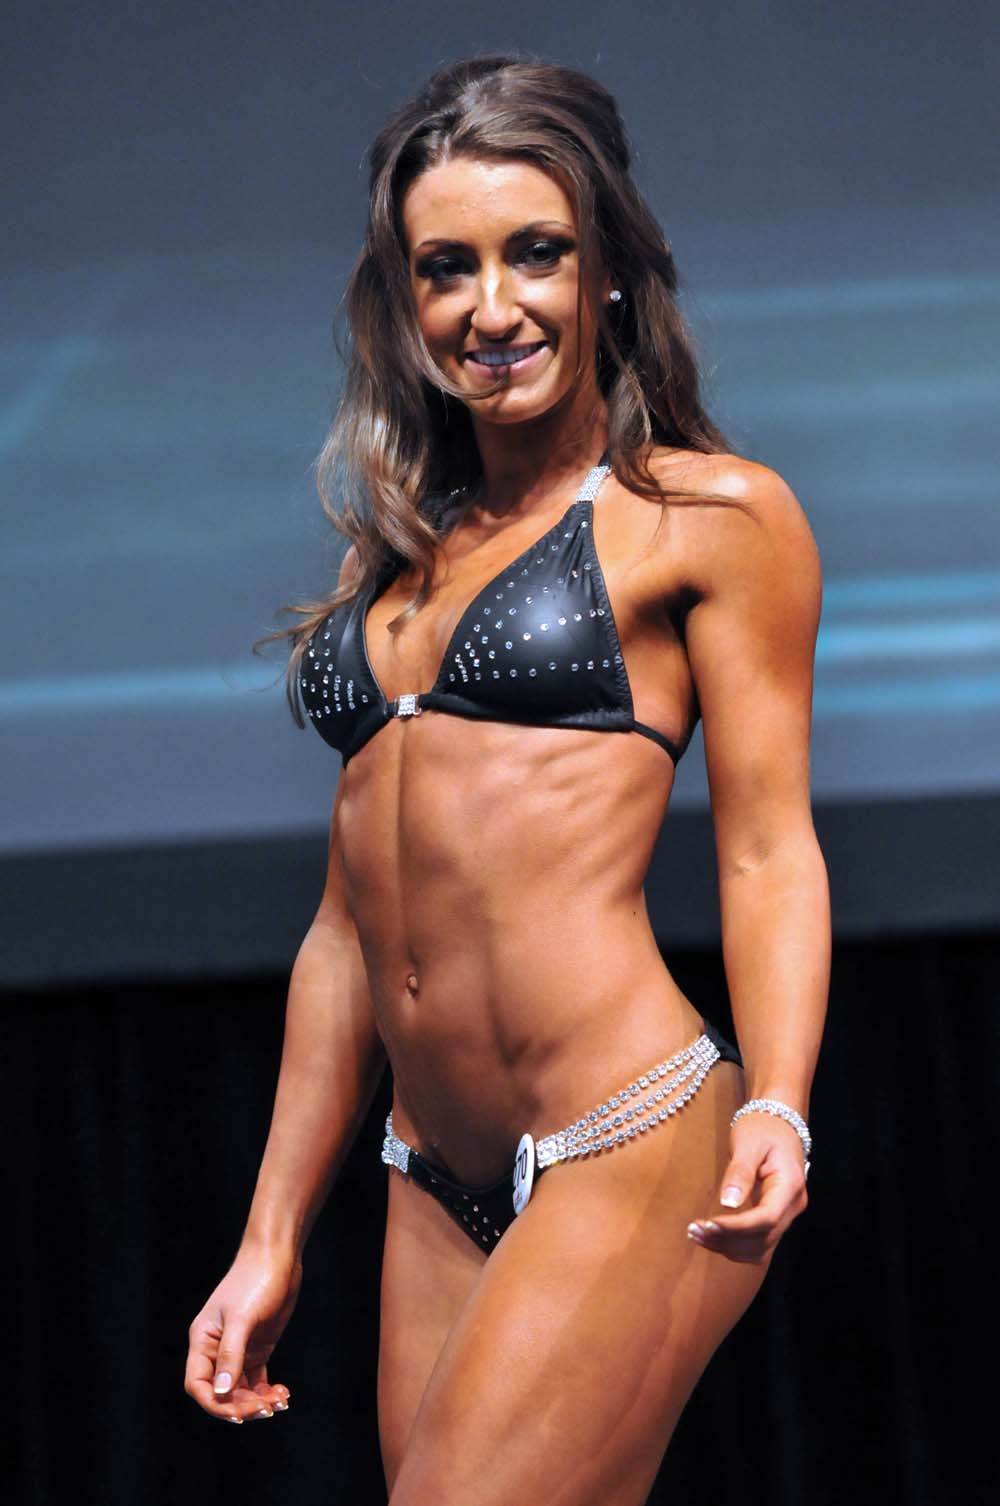 toronto grand prix tourist a toronto blog musclemag bikini model